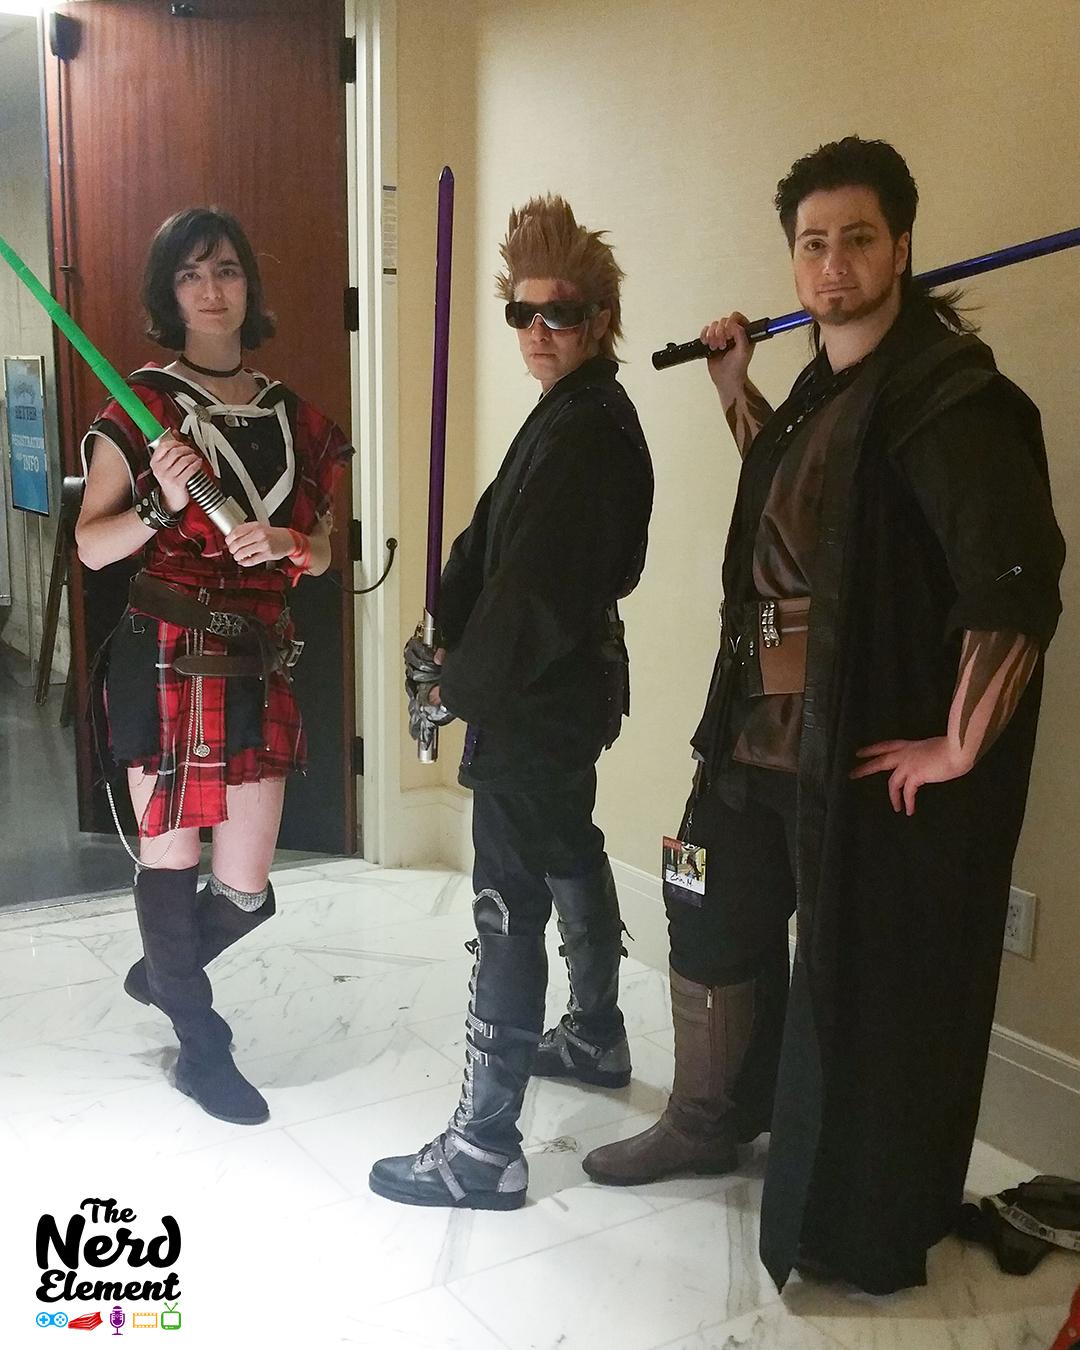 Jedi!Iris, Ignis, and Gladio (FFXV-SW mashup) Cosplayers: @kuewee (ig) @glasses.asshole (ig), and @varidian3 (ig)